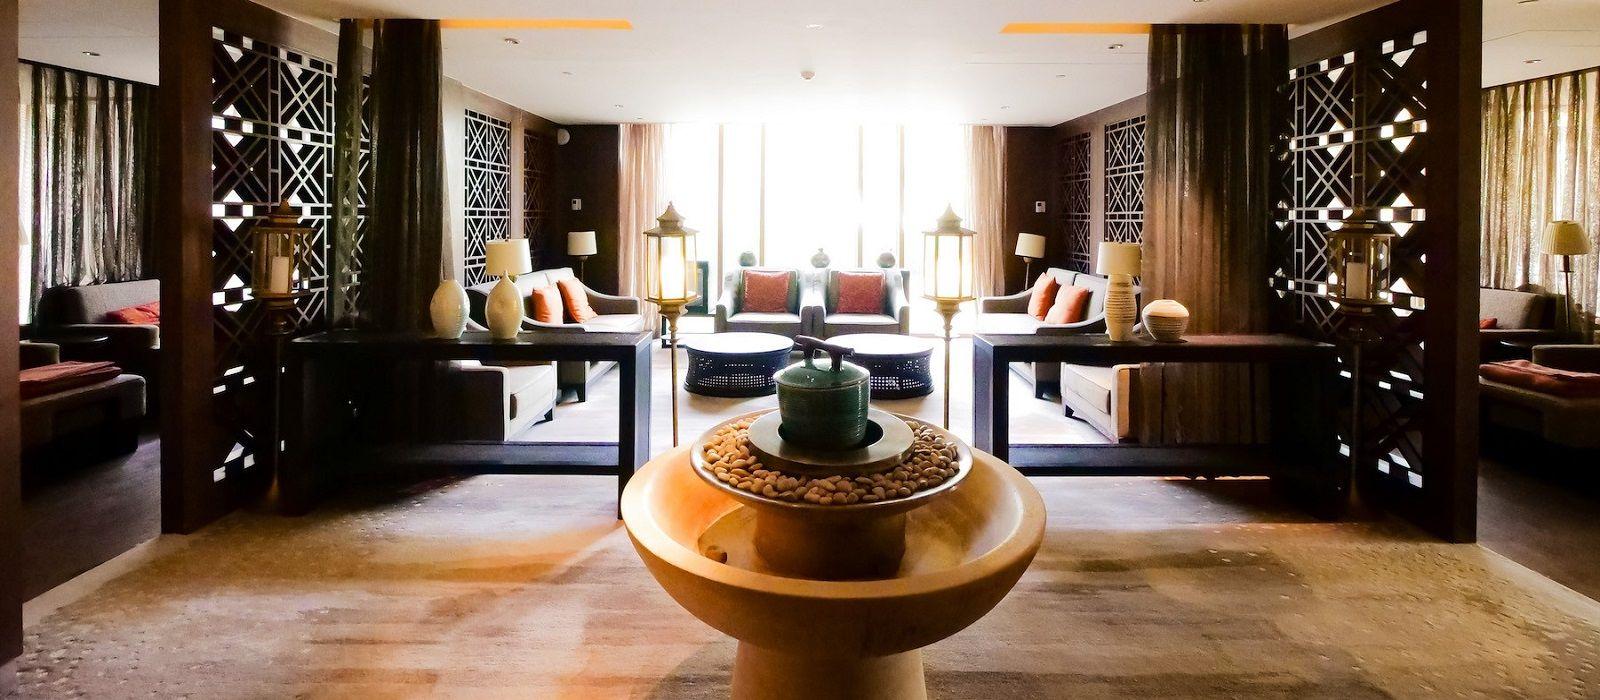 Hotel Shangri-La , Lhasa Tibet